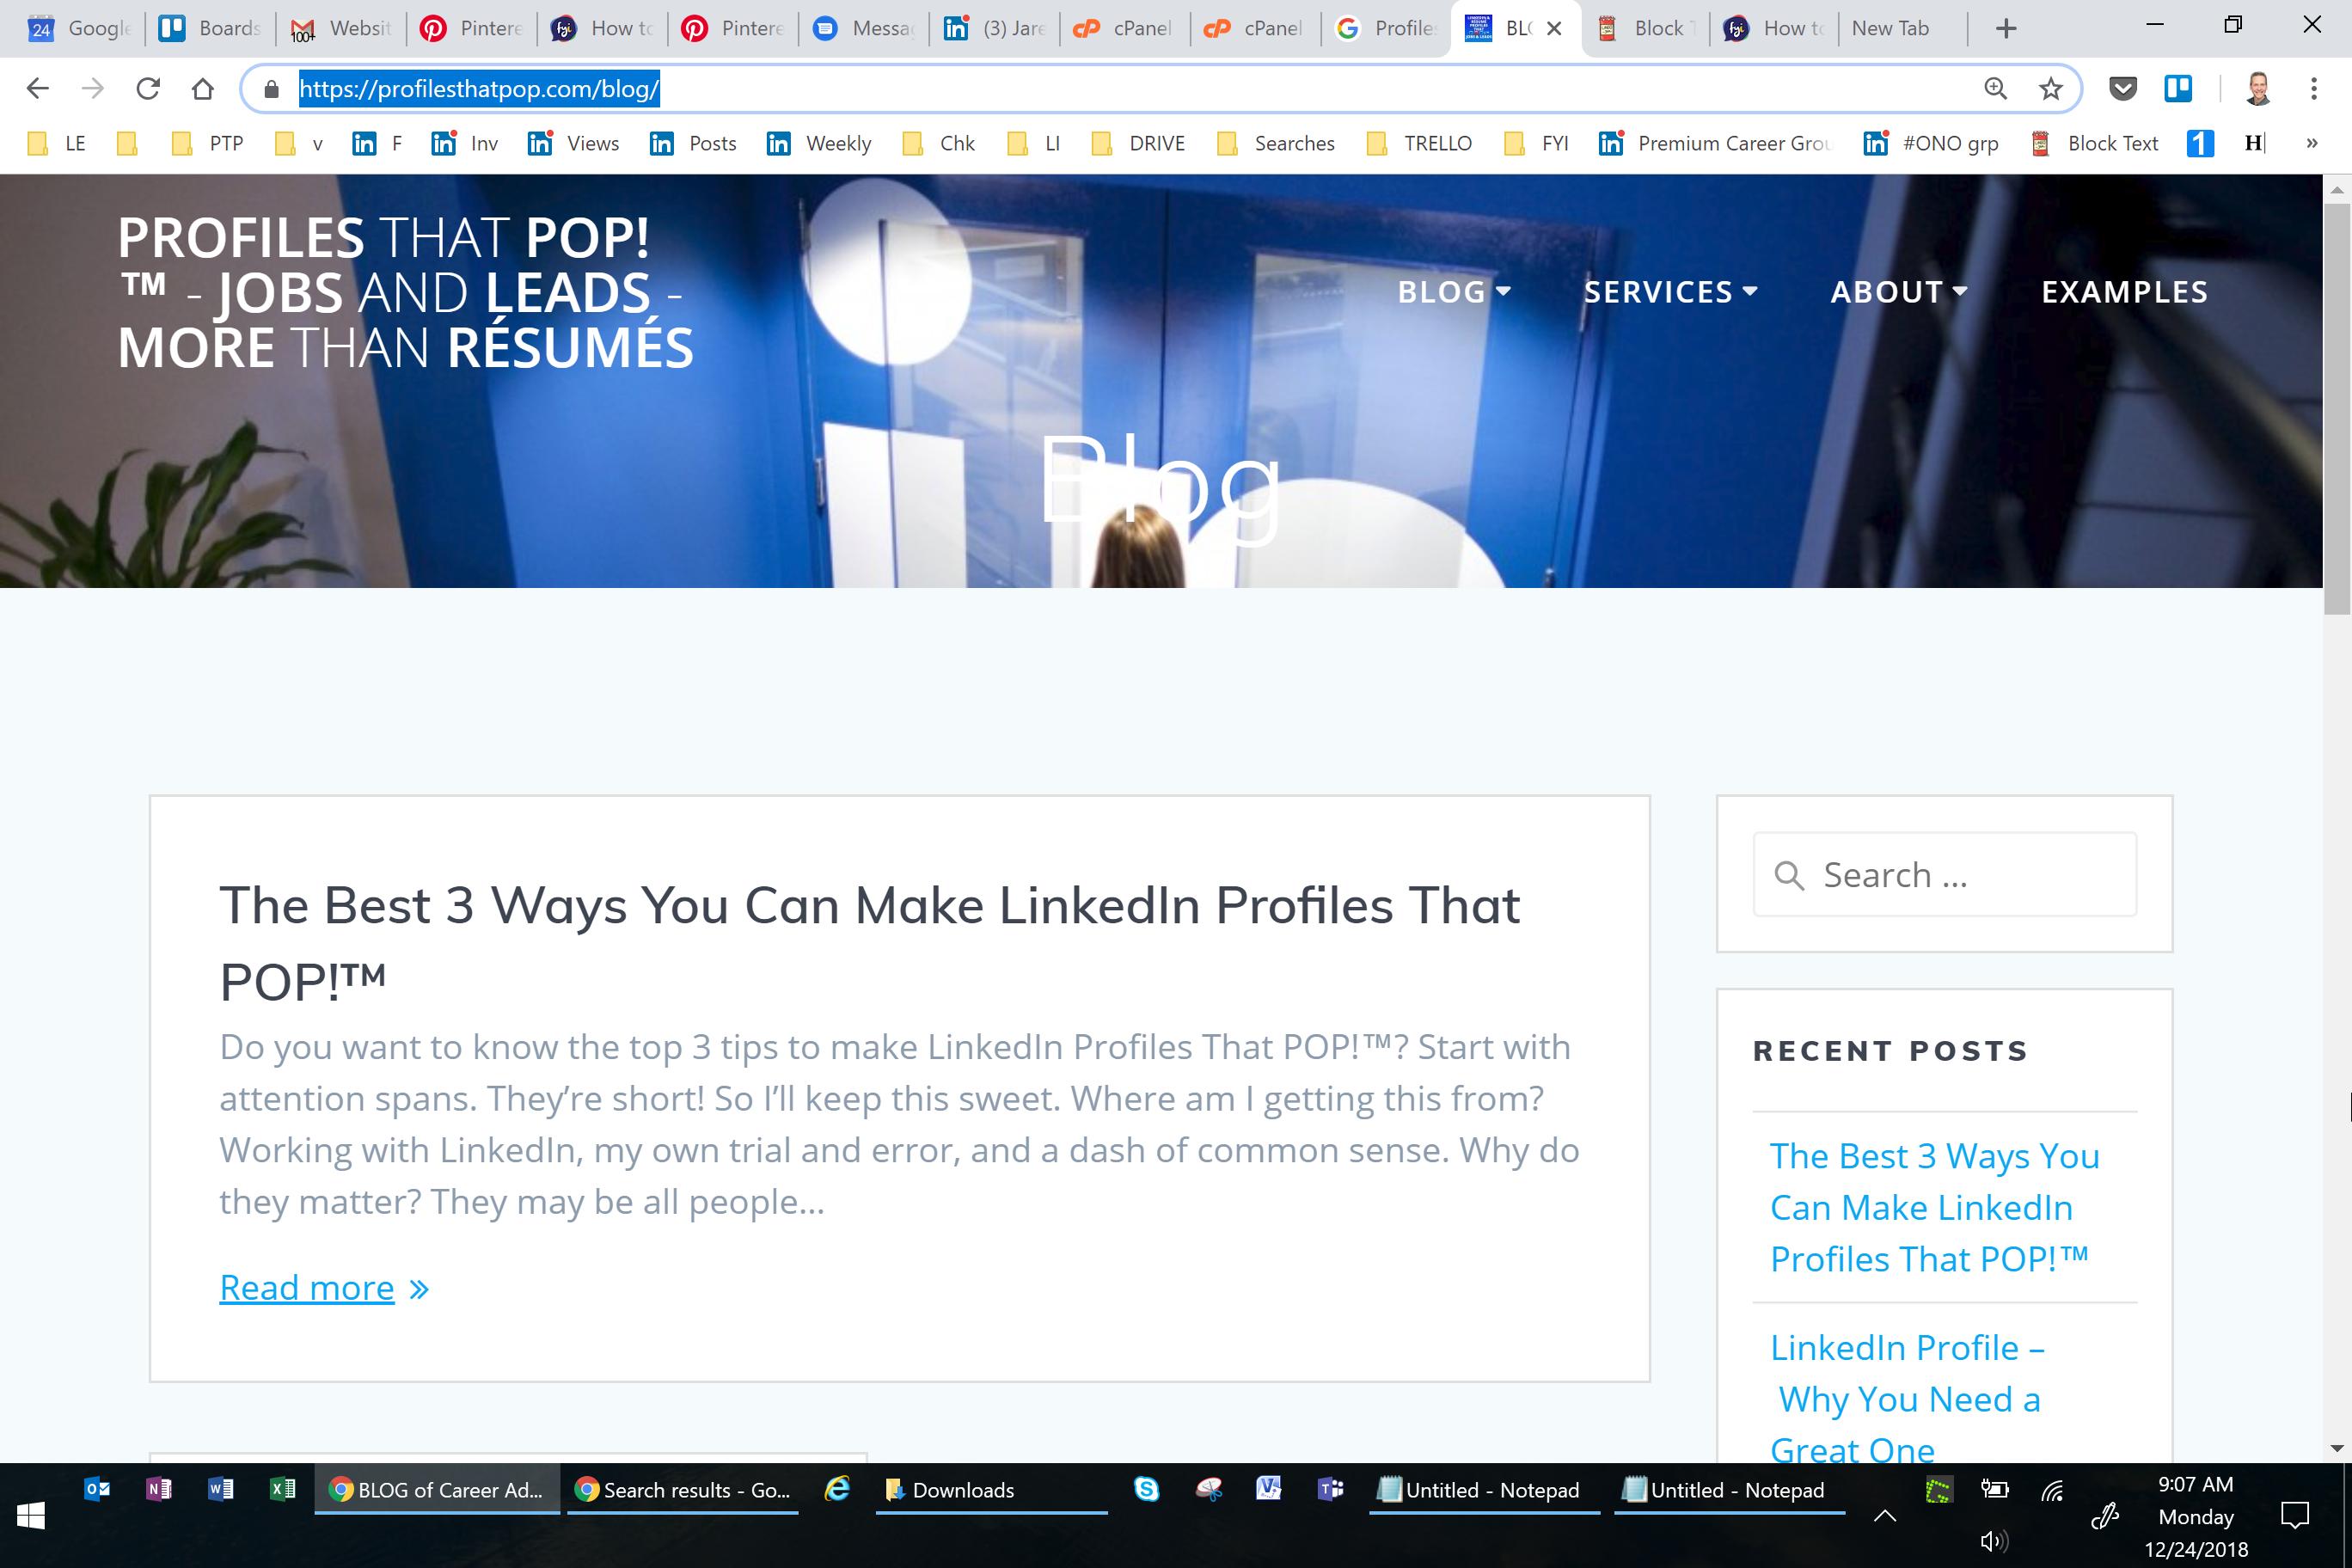 Blog of Profiles That POP!™ LinkedIn, Résumé and Career